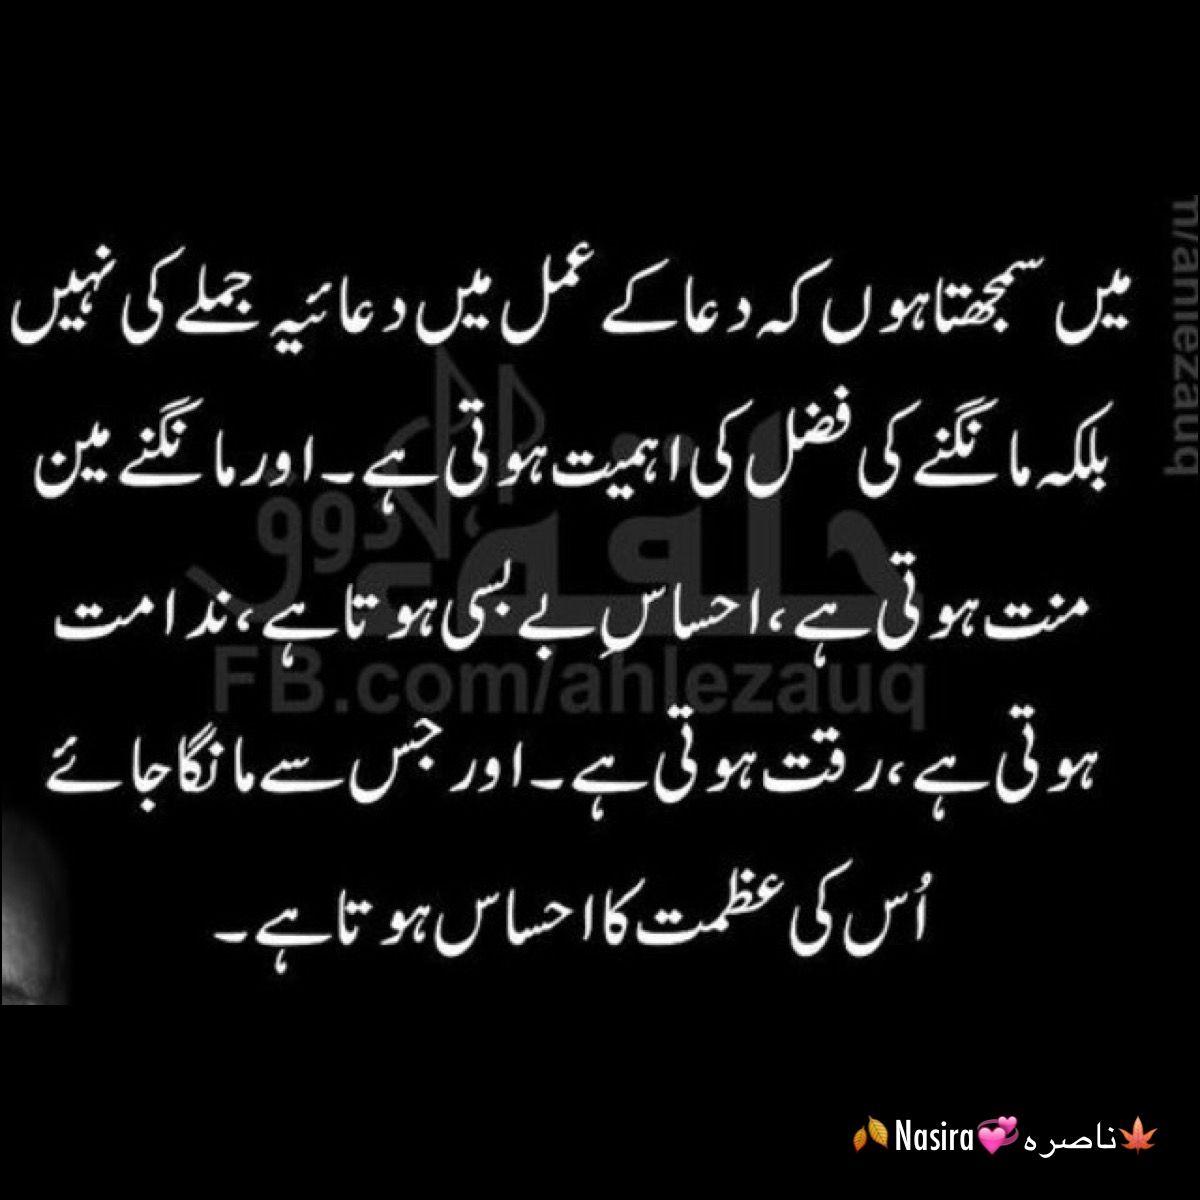 Quotes In Urdu Pinnasira Ahmad On Awesome Urdu Quotes & Poetry  Pinterest